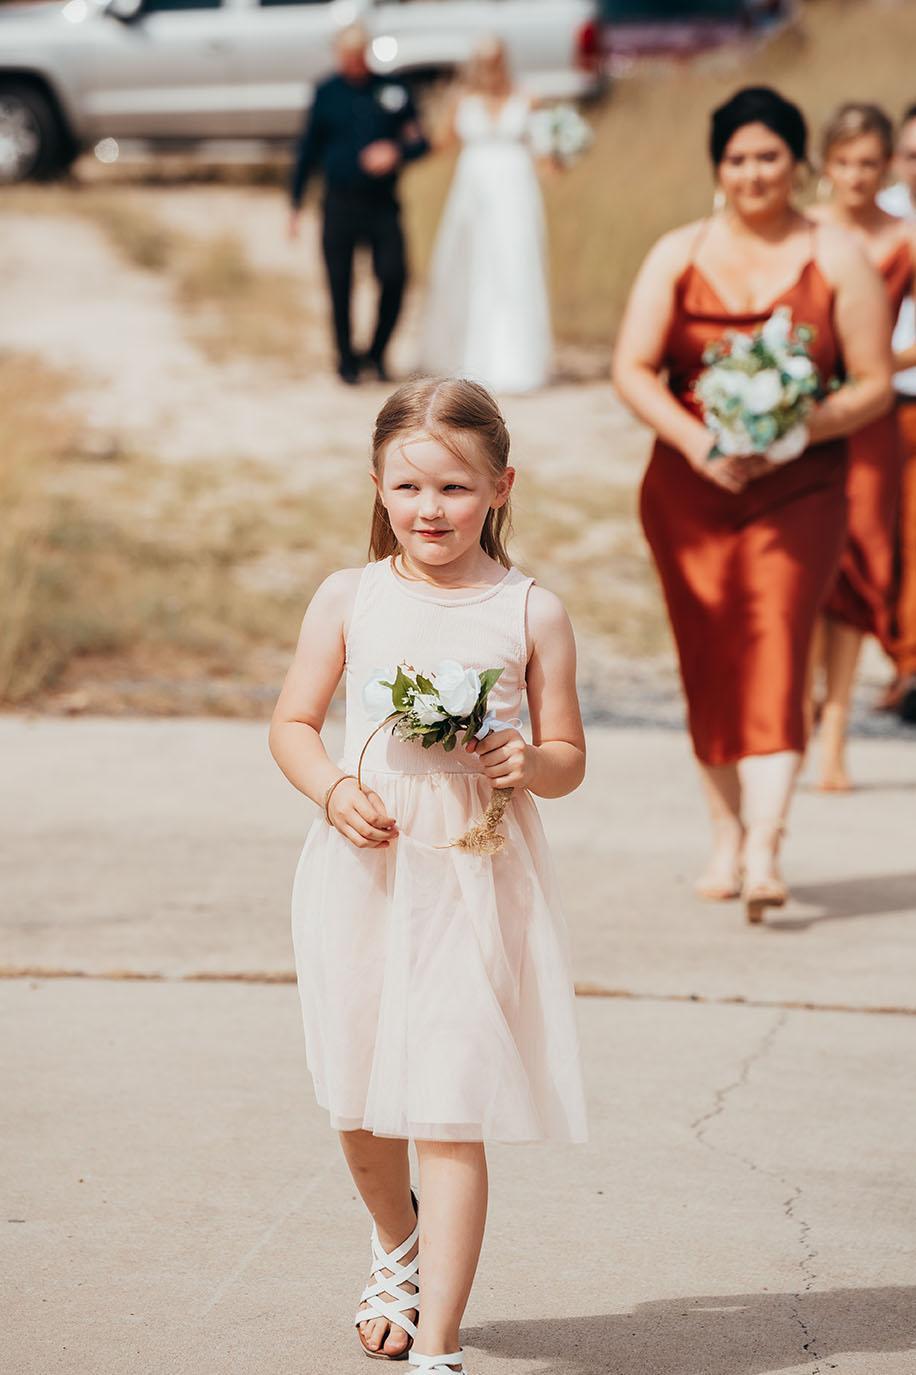 Wedding Photography - flower girl